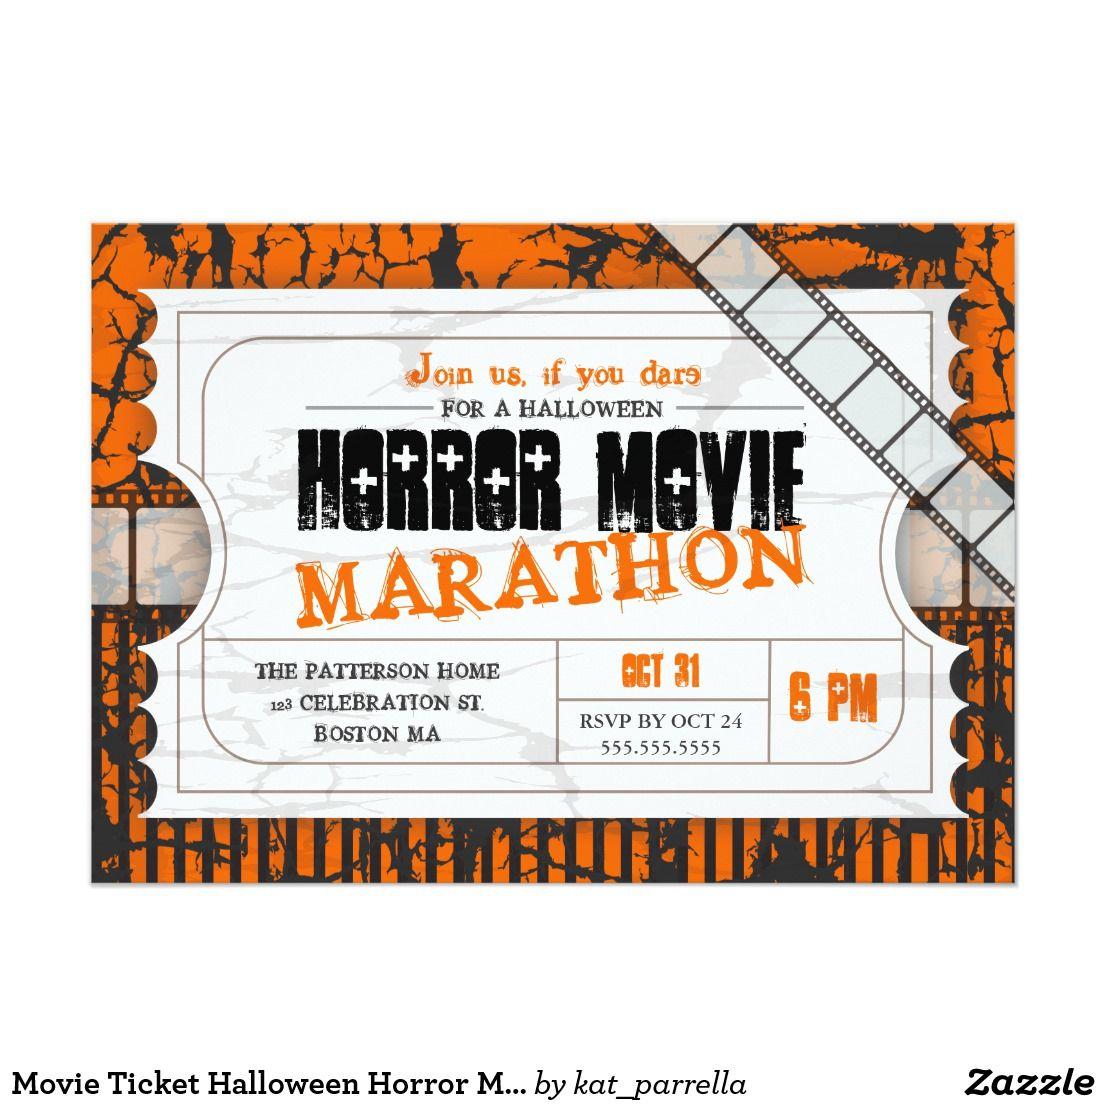 Movie Ticket Halloween Horror Movie Party Invitation